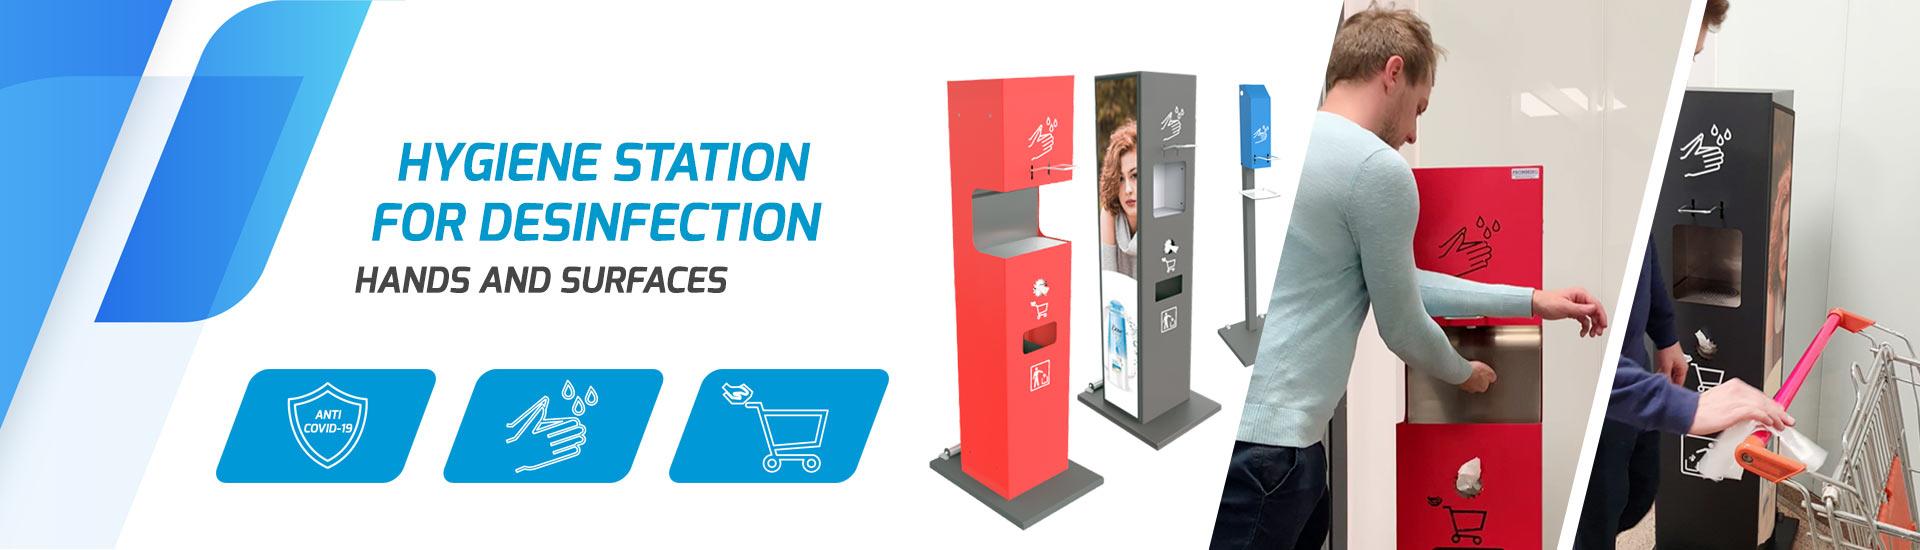 Hygiene station for desinfection